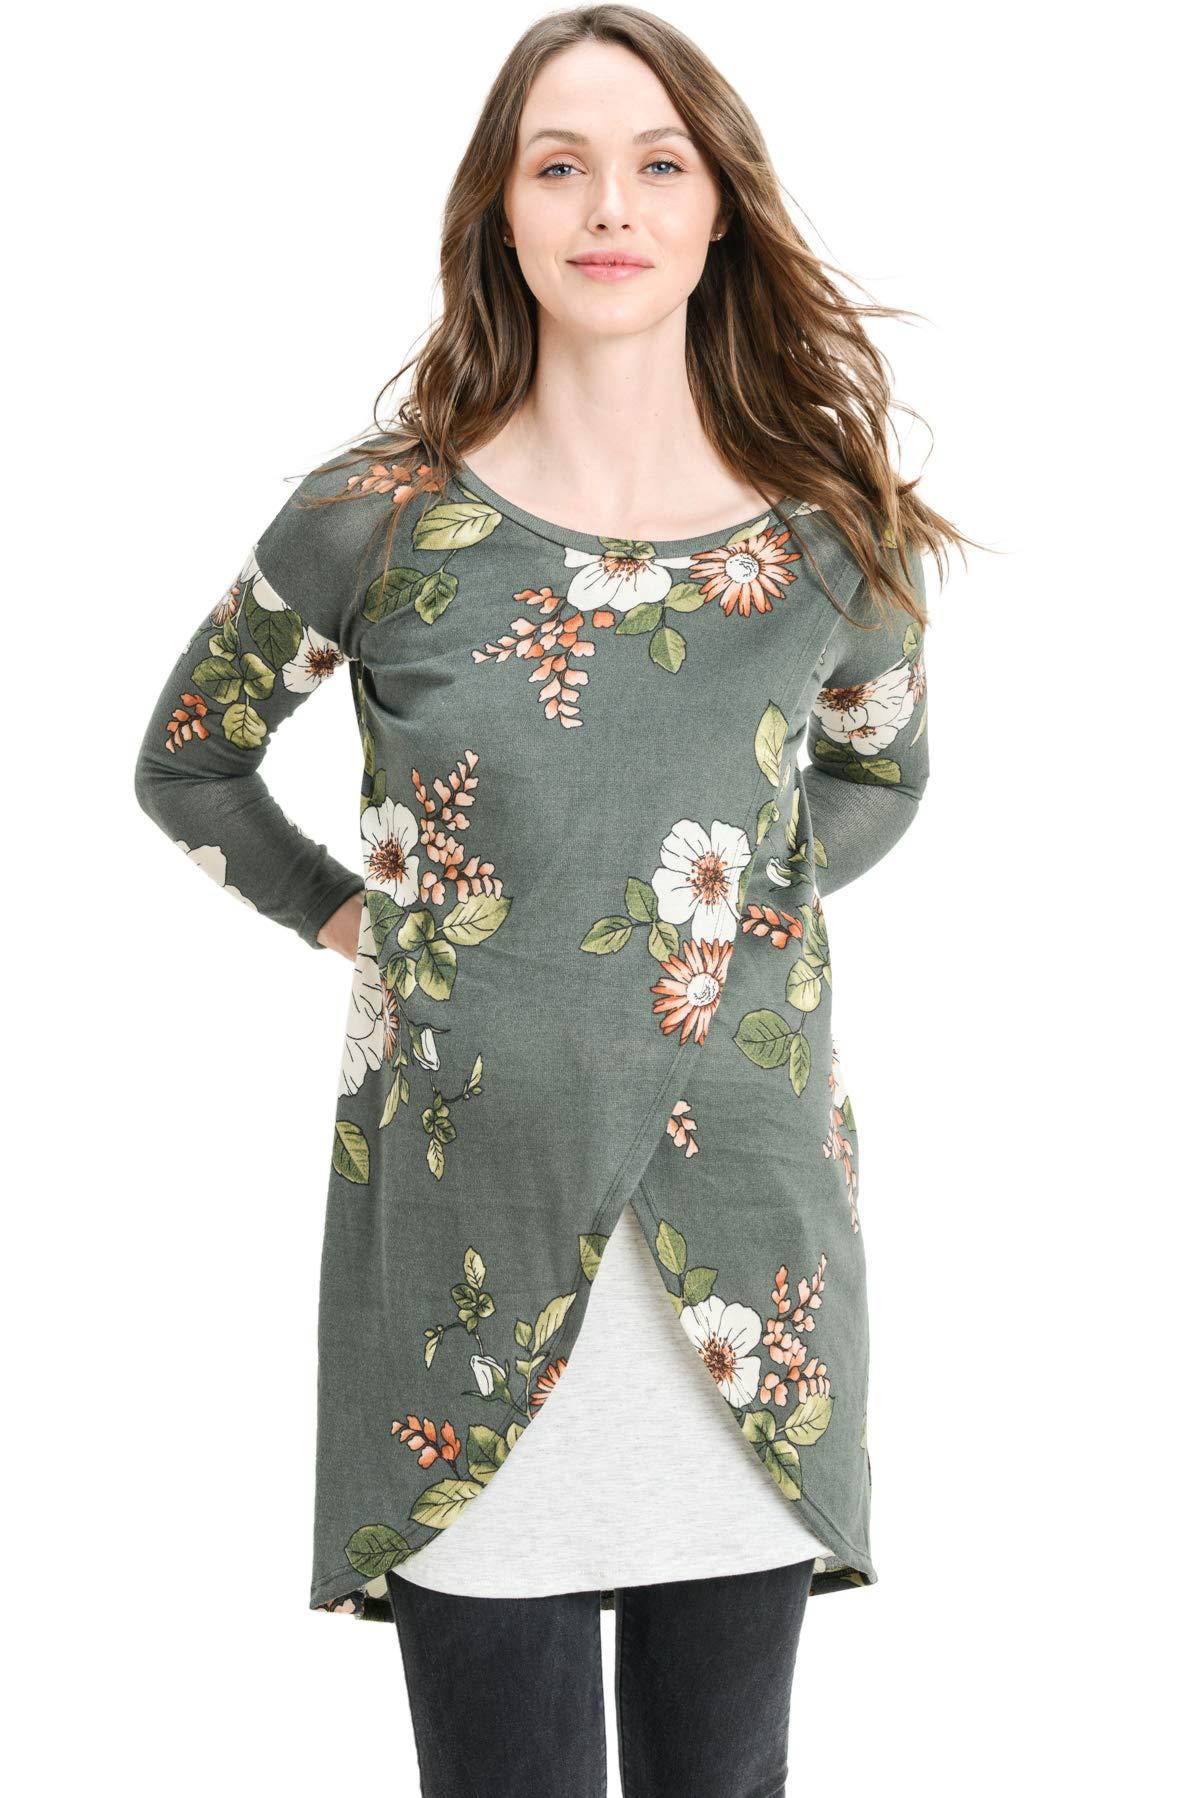 Hello MIZ Women's Sweater Knit Long Sleeve Maternity Nursing Tunic Dress (Olive Flower/Grey, L)